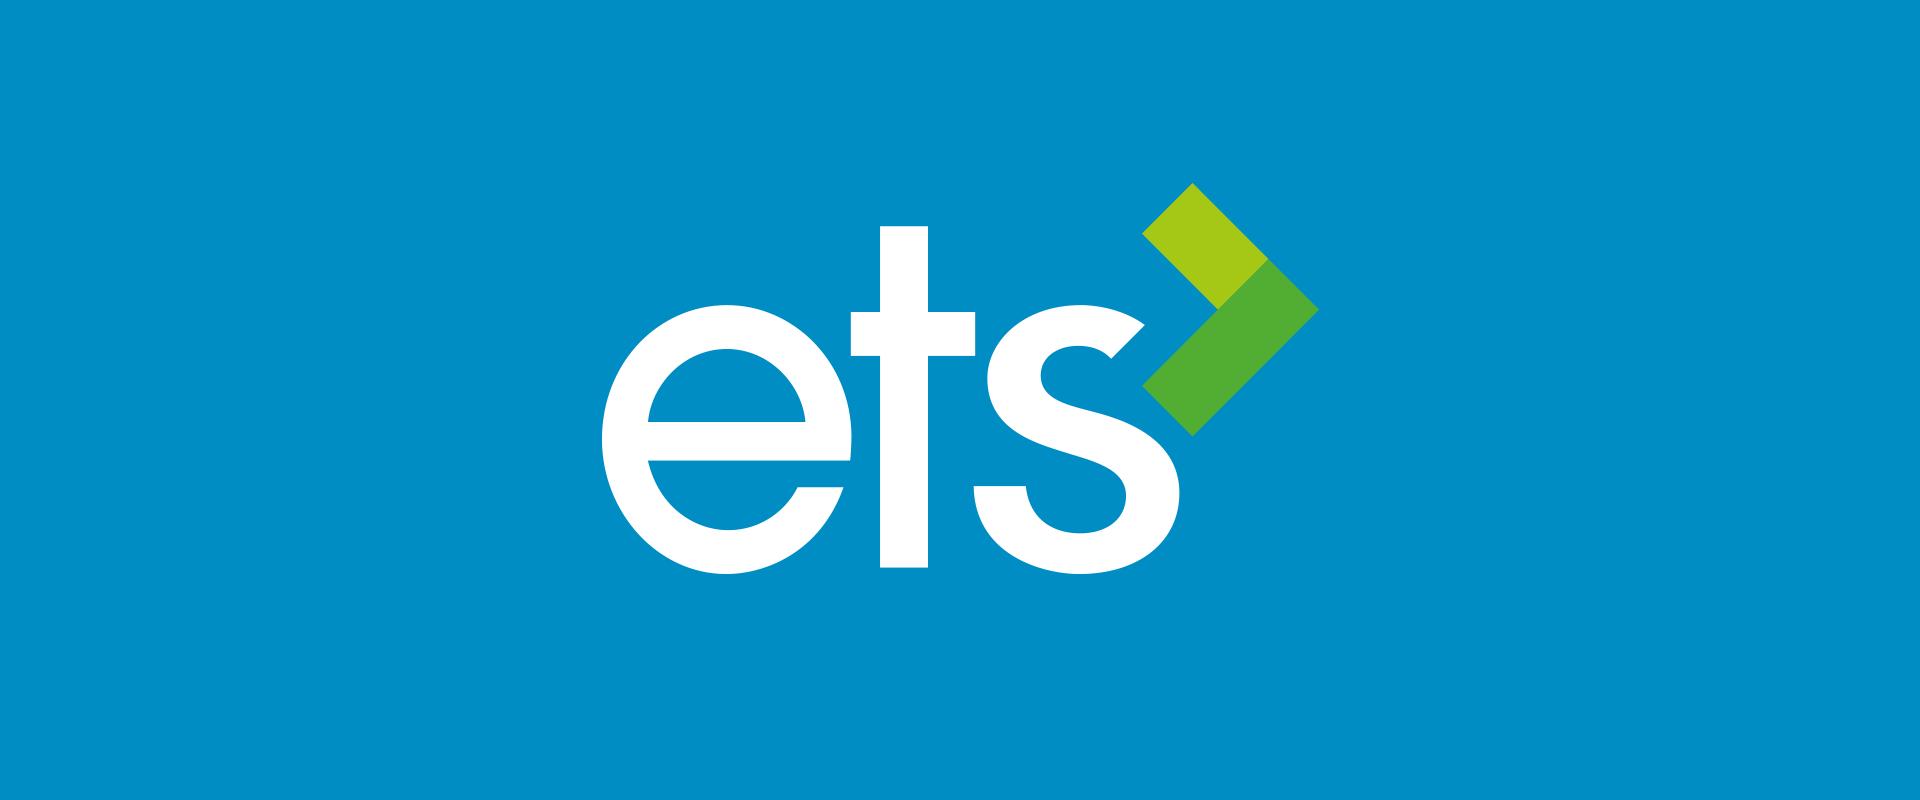 ETS : COMMERCE, MARKETING, MANAGEMENT